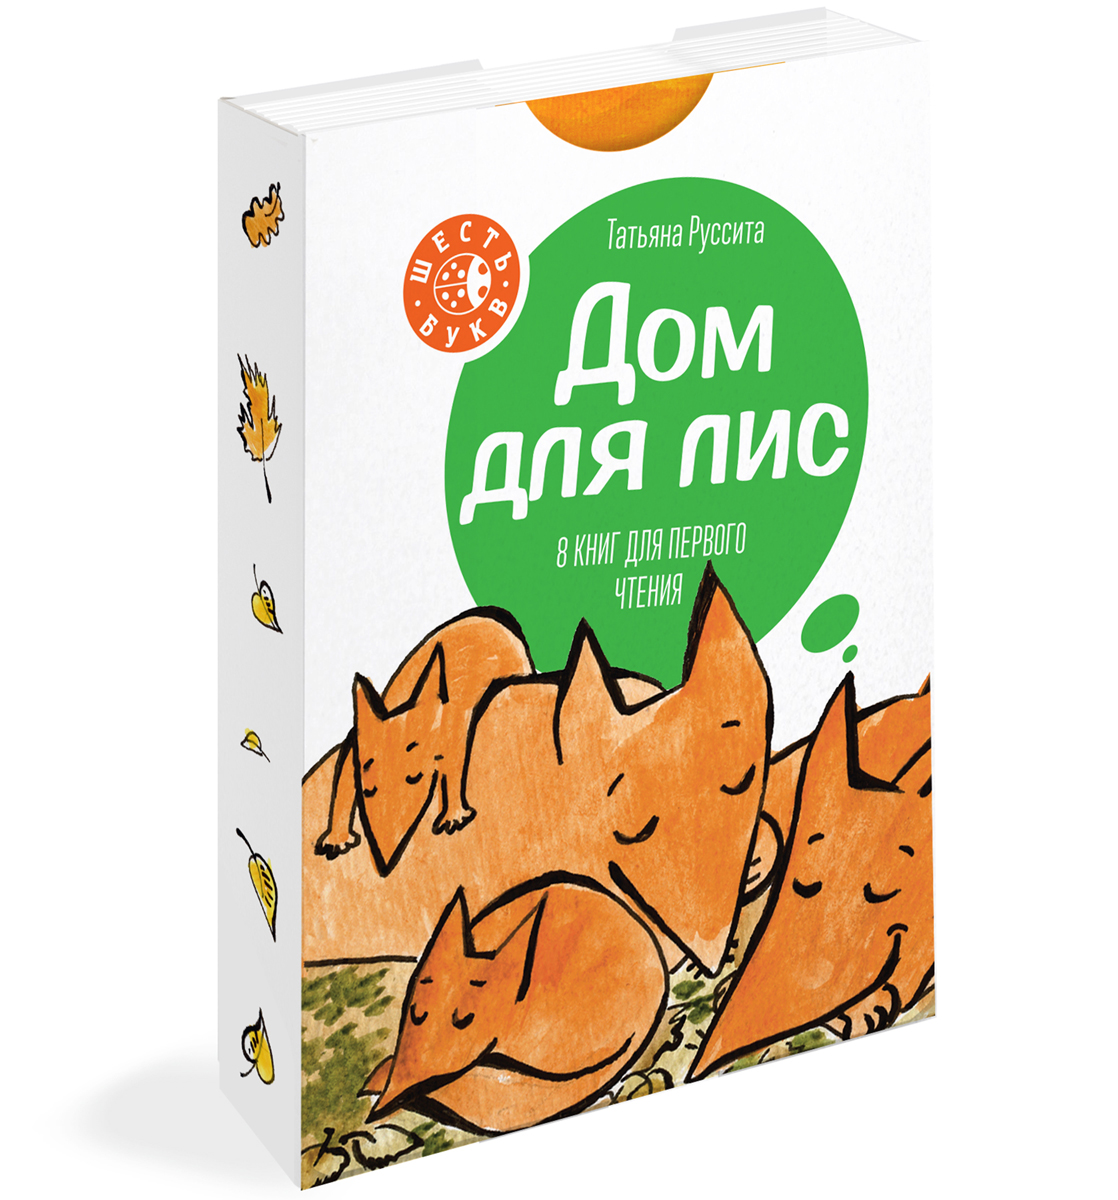 Татьяна Руссита Дом для лис